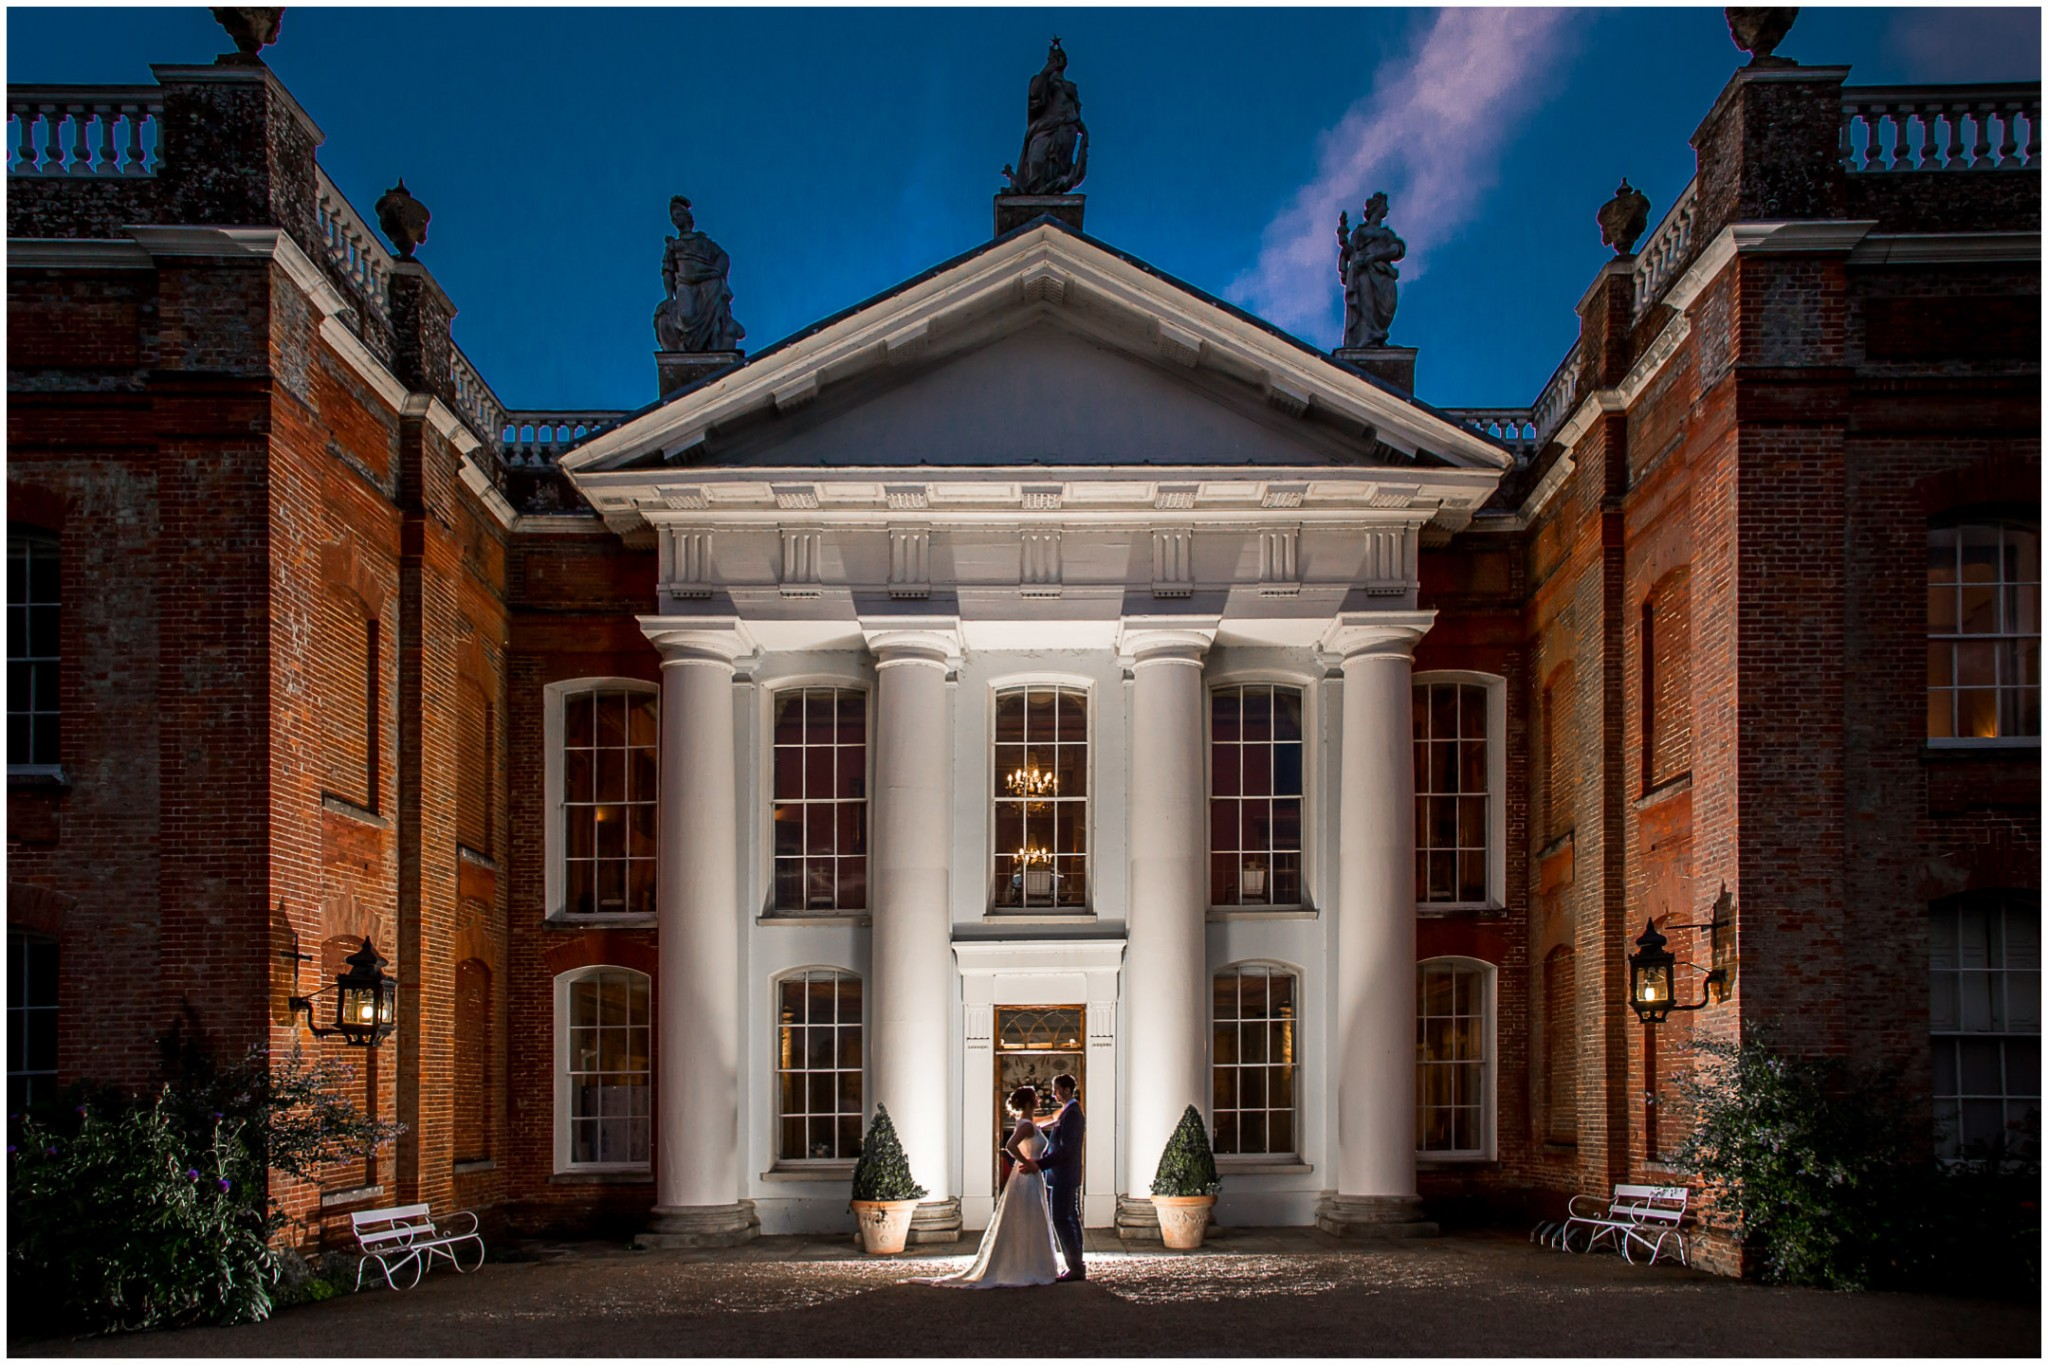 Avington Park Wedding Photographer Evening Exterior Portrait